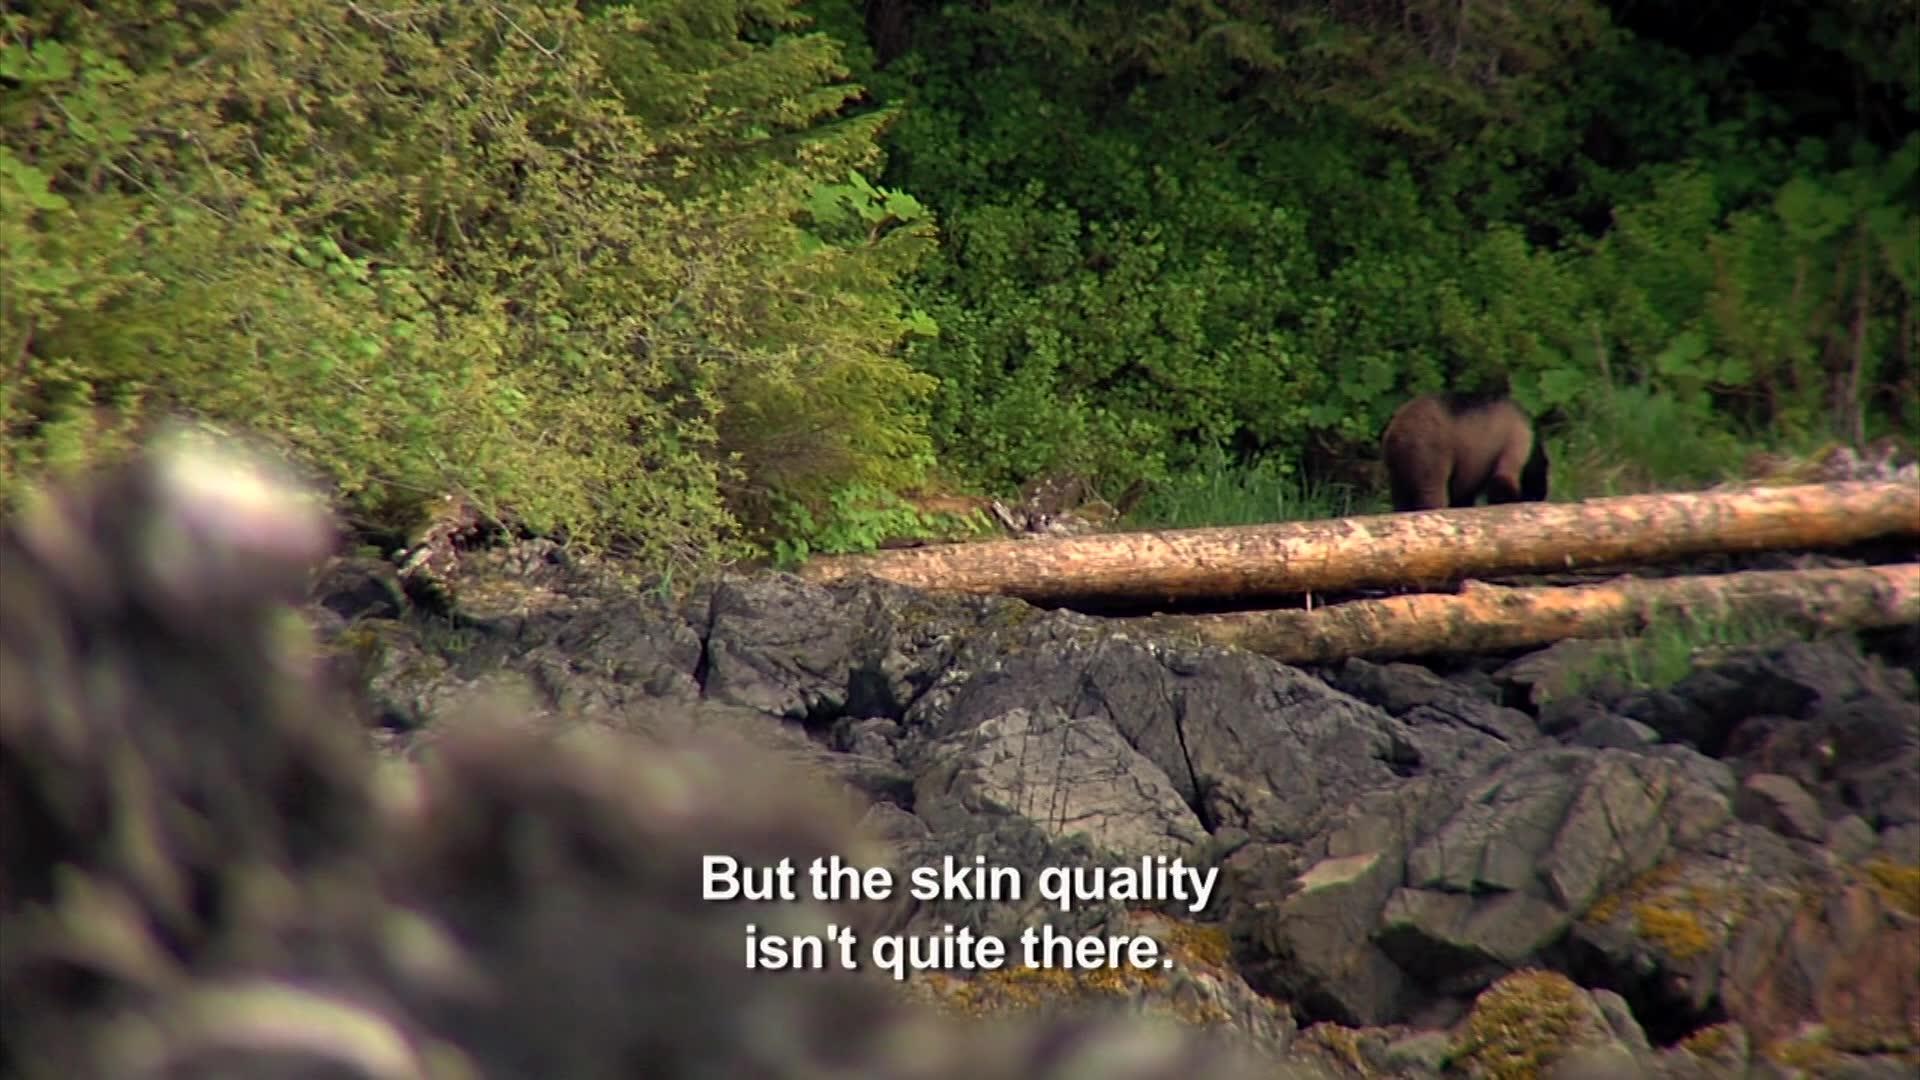 Bear by Boat - SWAROVSKI OPTIK Quests